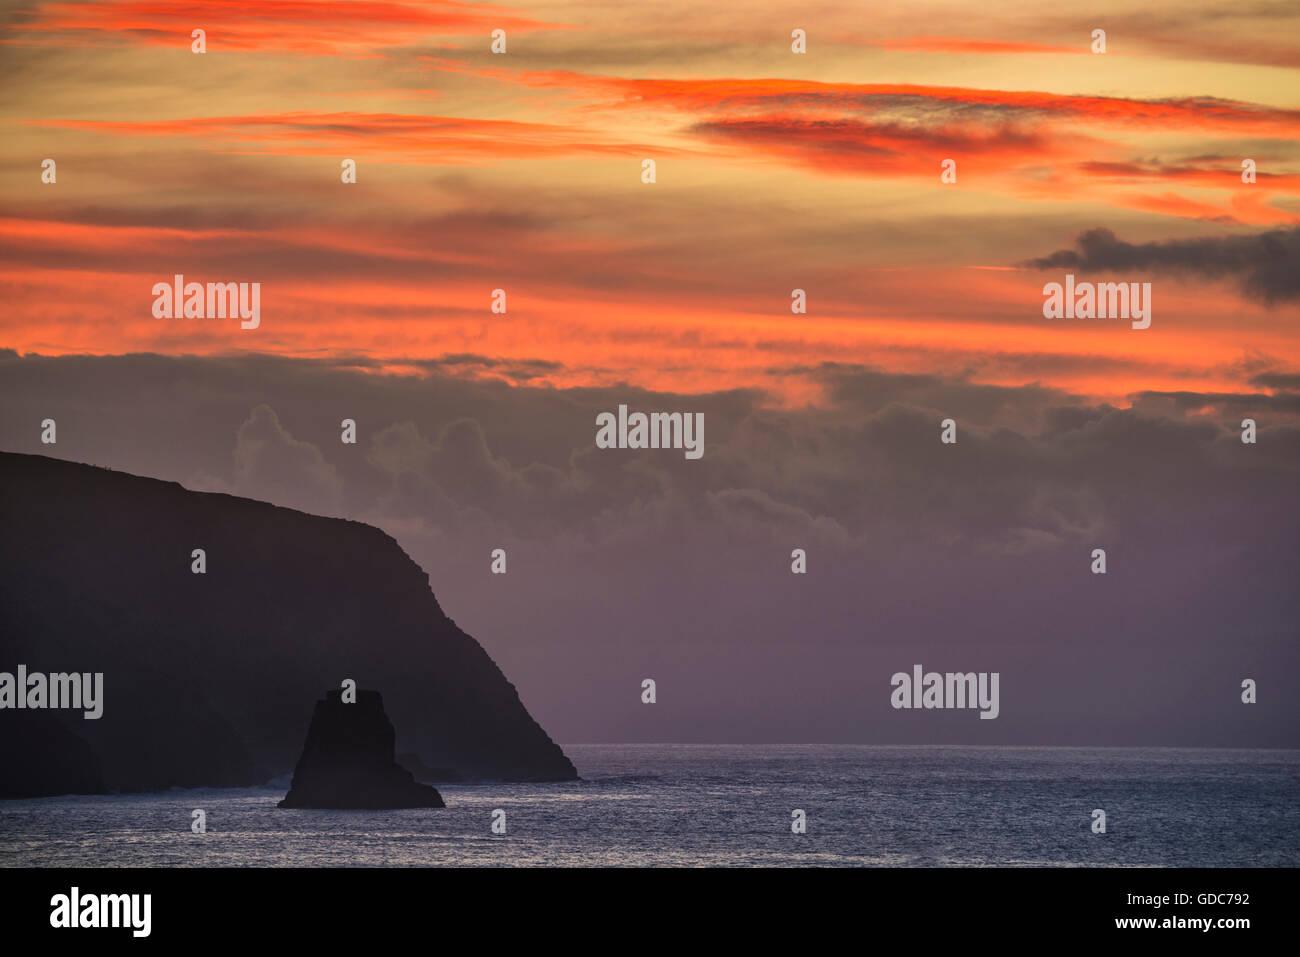 South America,Chile,Easter Island,Isla de Pasqua,south pacific,UNESCO,World Heritage,sunrise - Stock Image